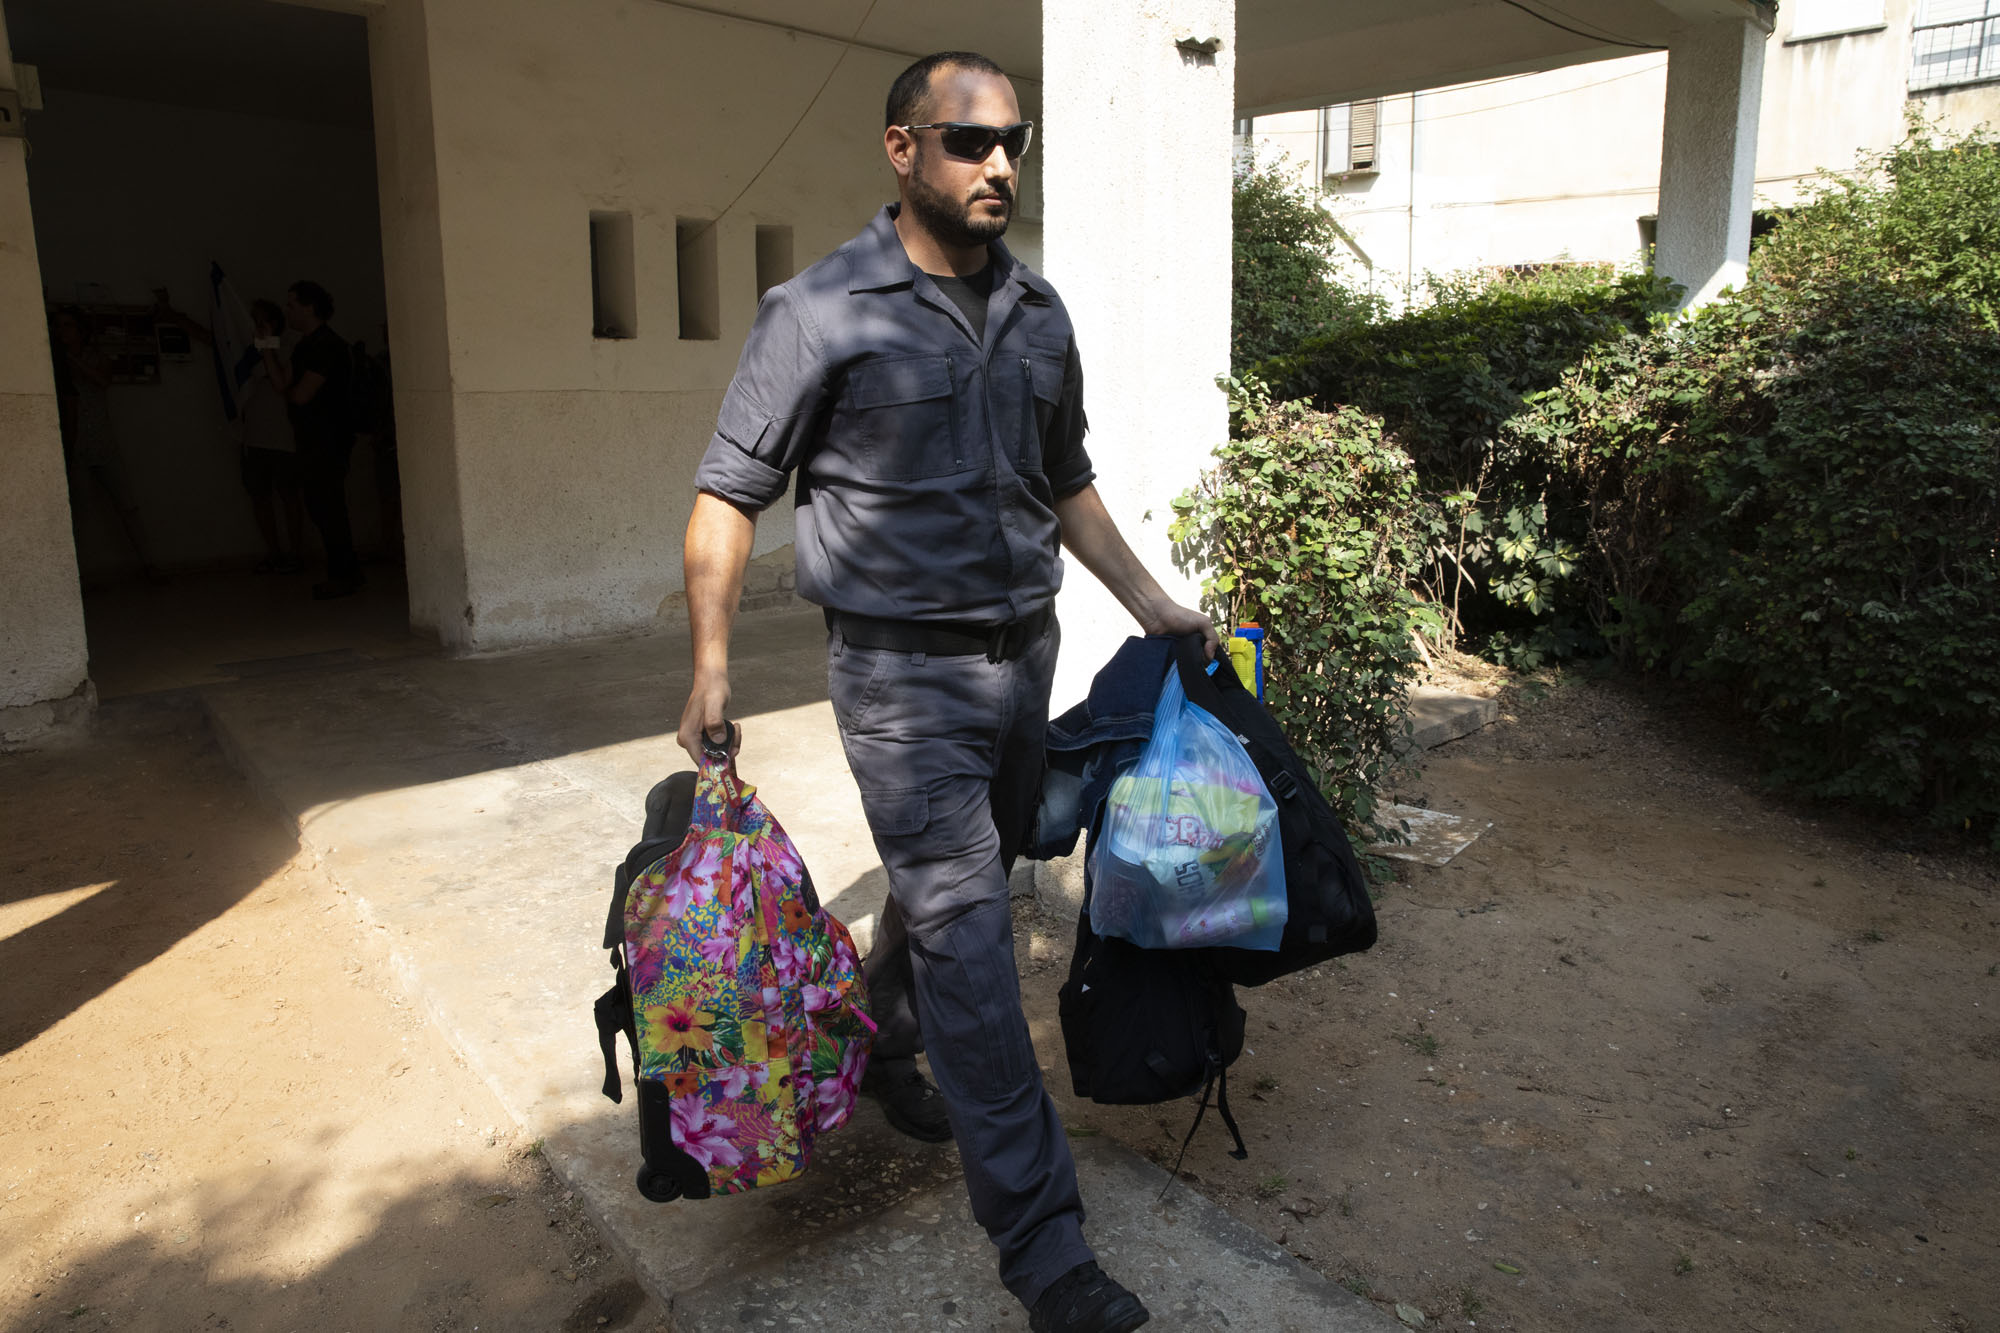 An Israeli immigration officer carries bags from Geraldine Esta's home in Ramat Gan, July 23, 2019. (Oren Ziv/Activestills.org)